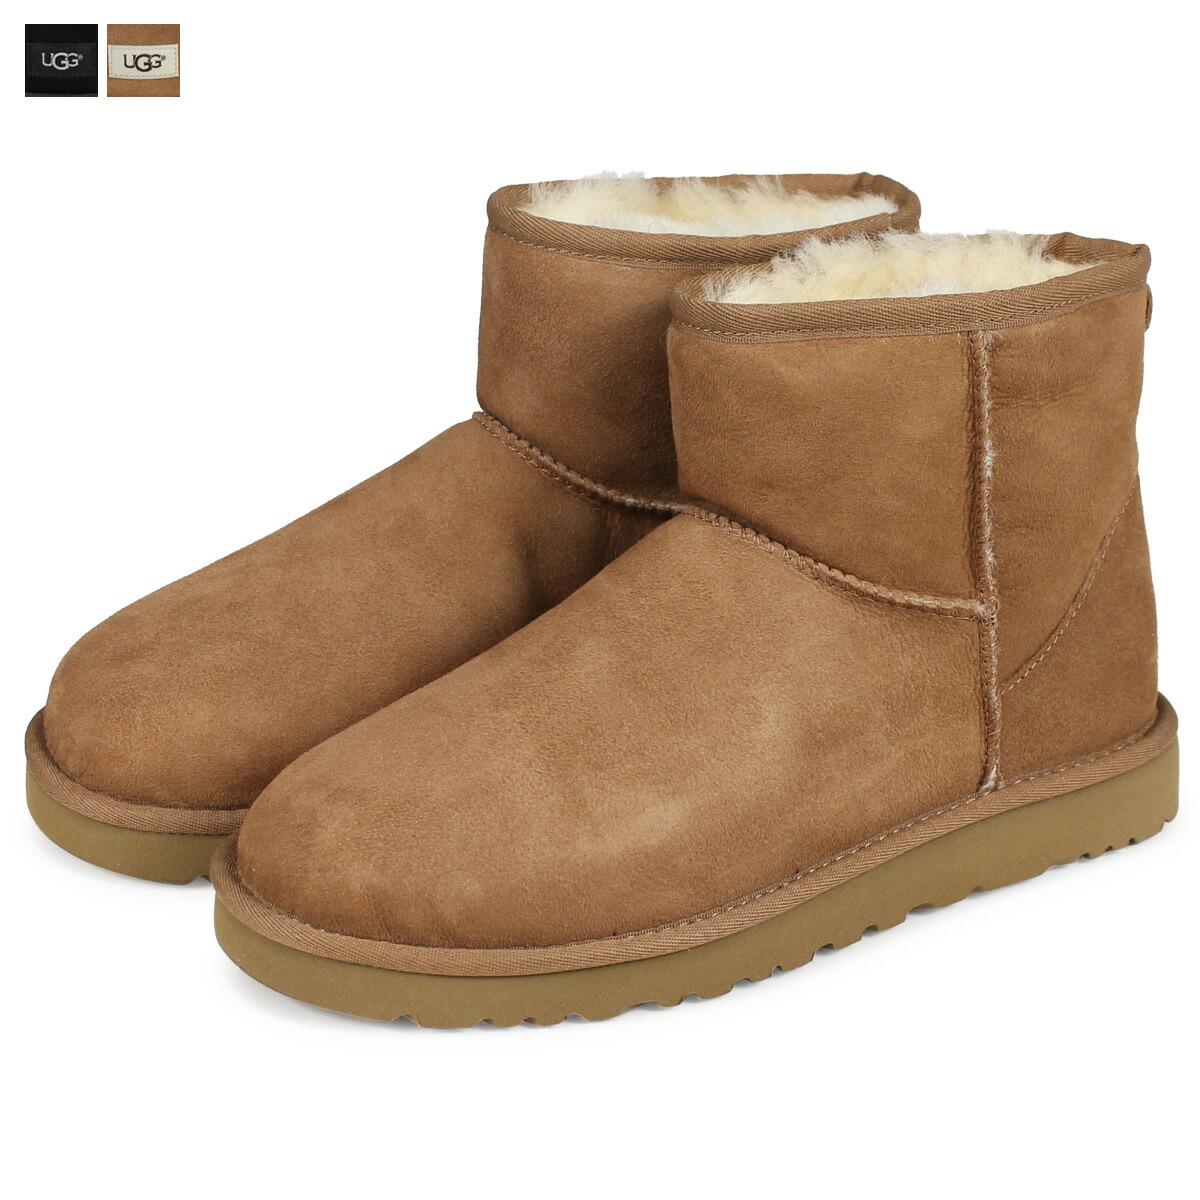 2262240c262 UGG UGG men's classic mini Sheepskin boots MENS CLASSIC MINI 1002072